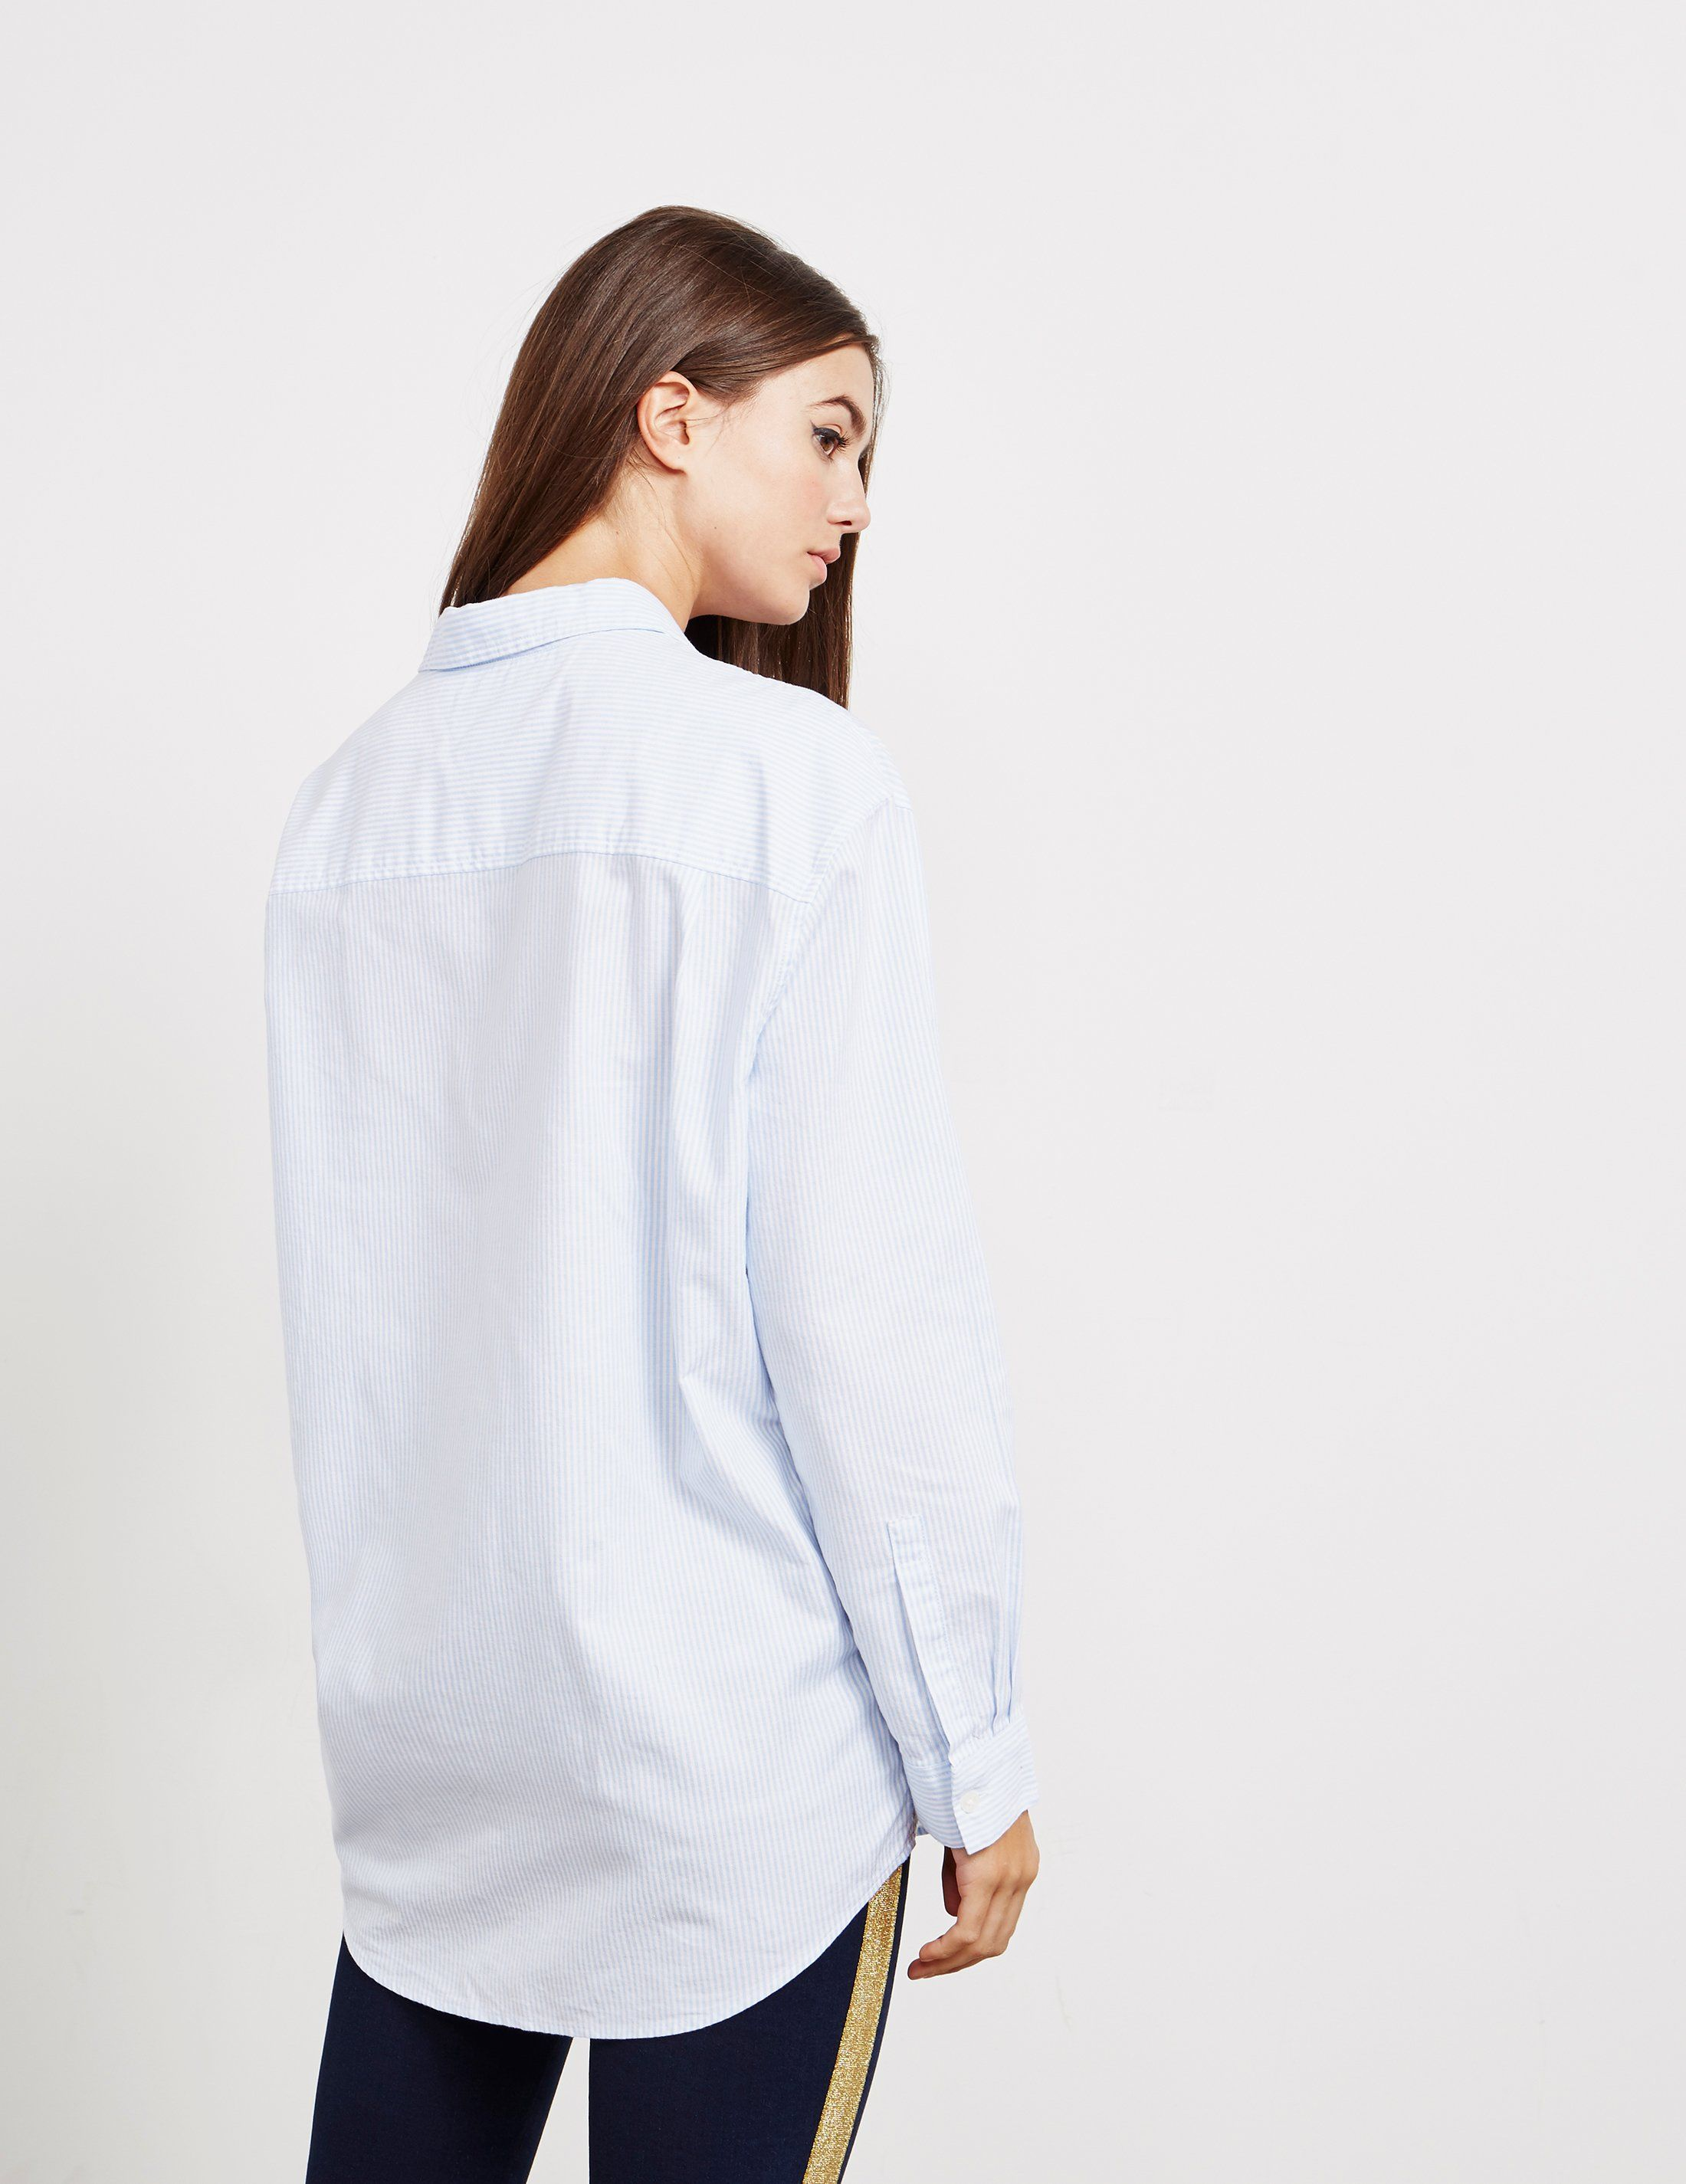 Tommy Hilfiger Boyfriend Long Sleeve Shirt - Online Exclusive